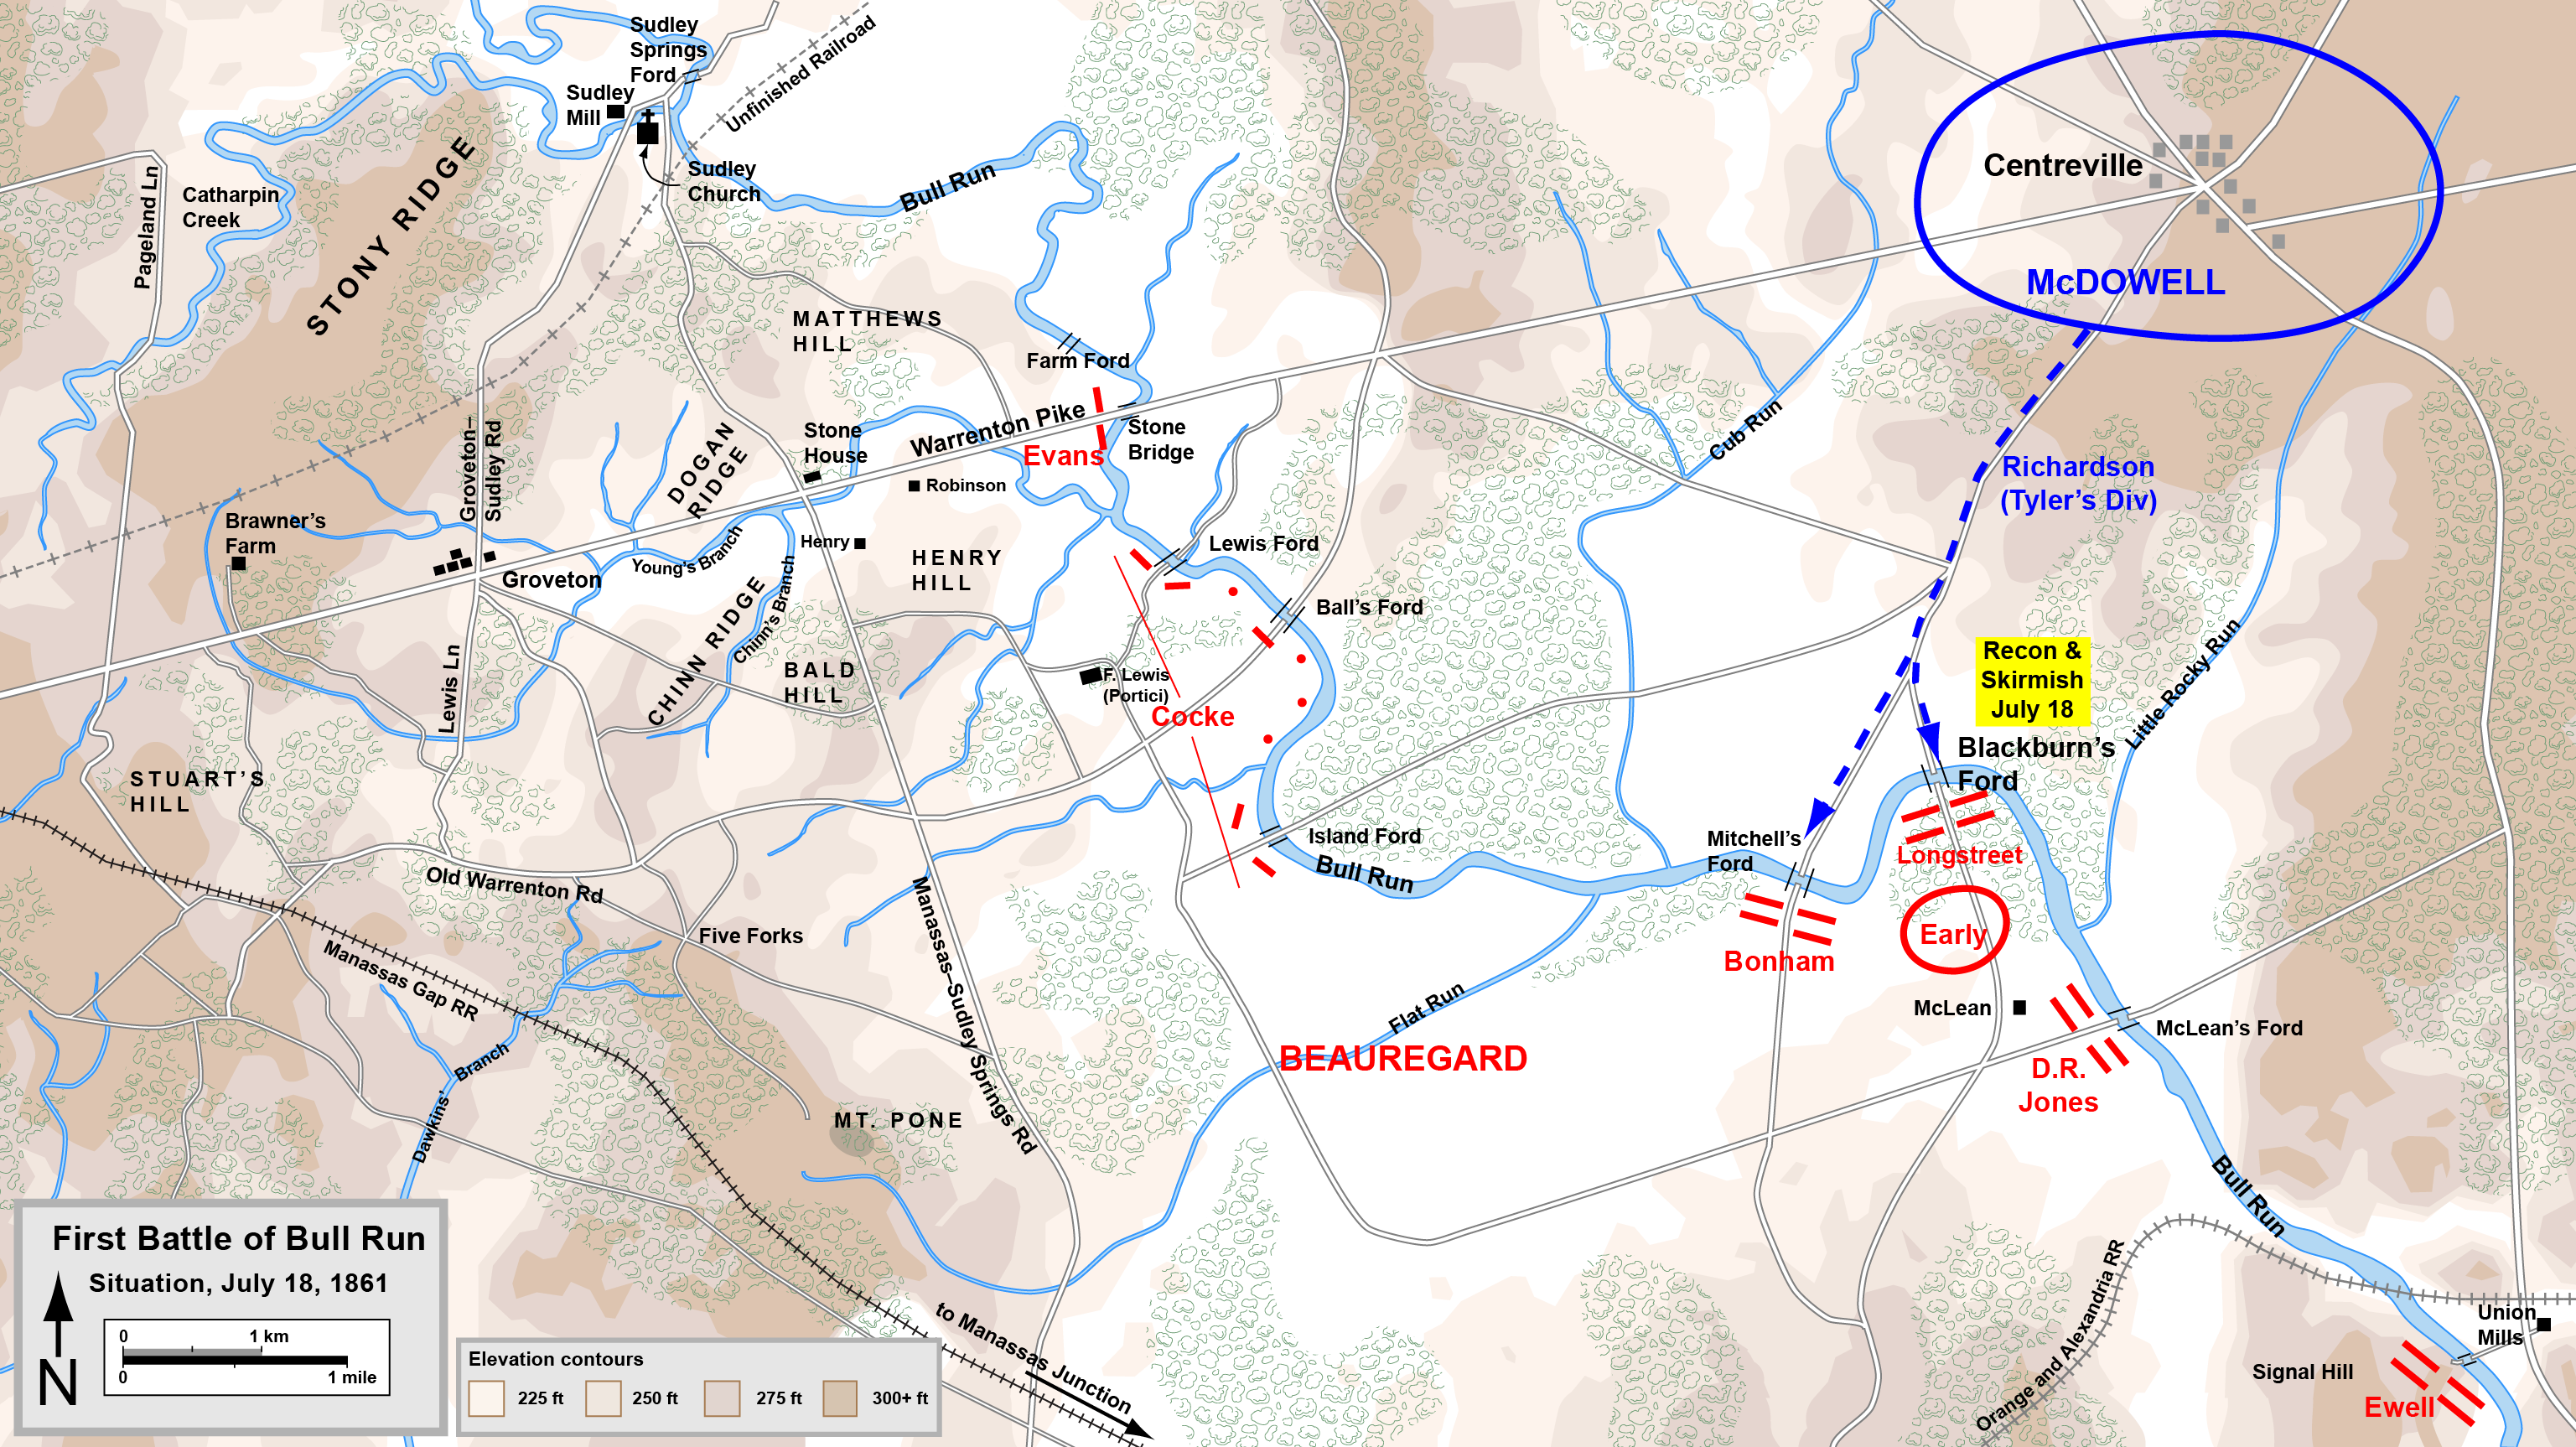 FileFirst Bull Run Julypng Wikimedia Commons - How far did i run map